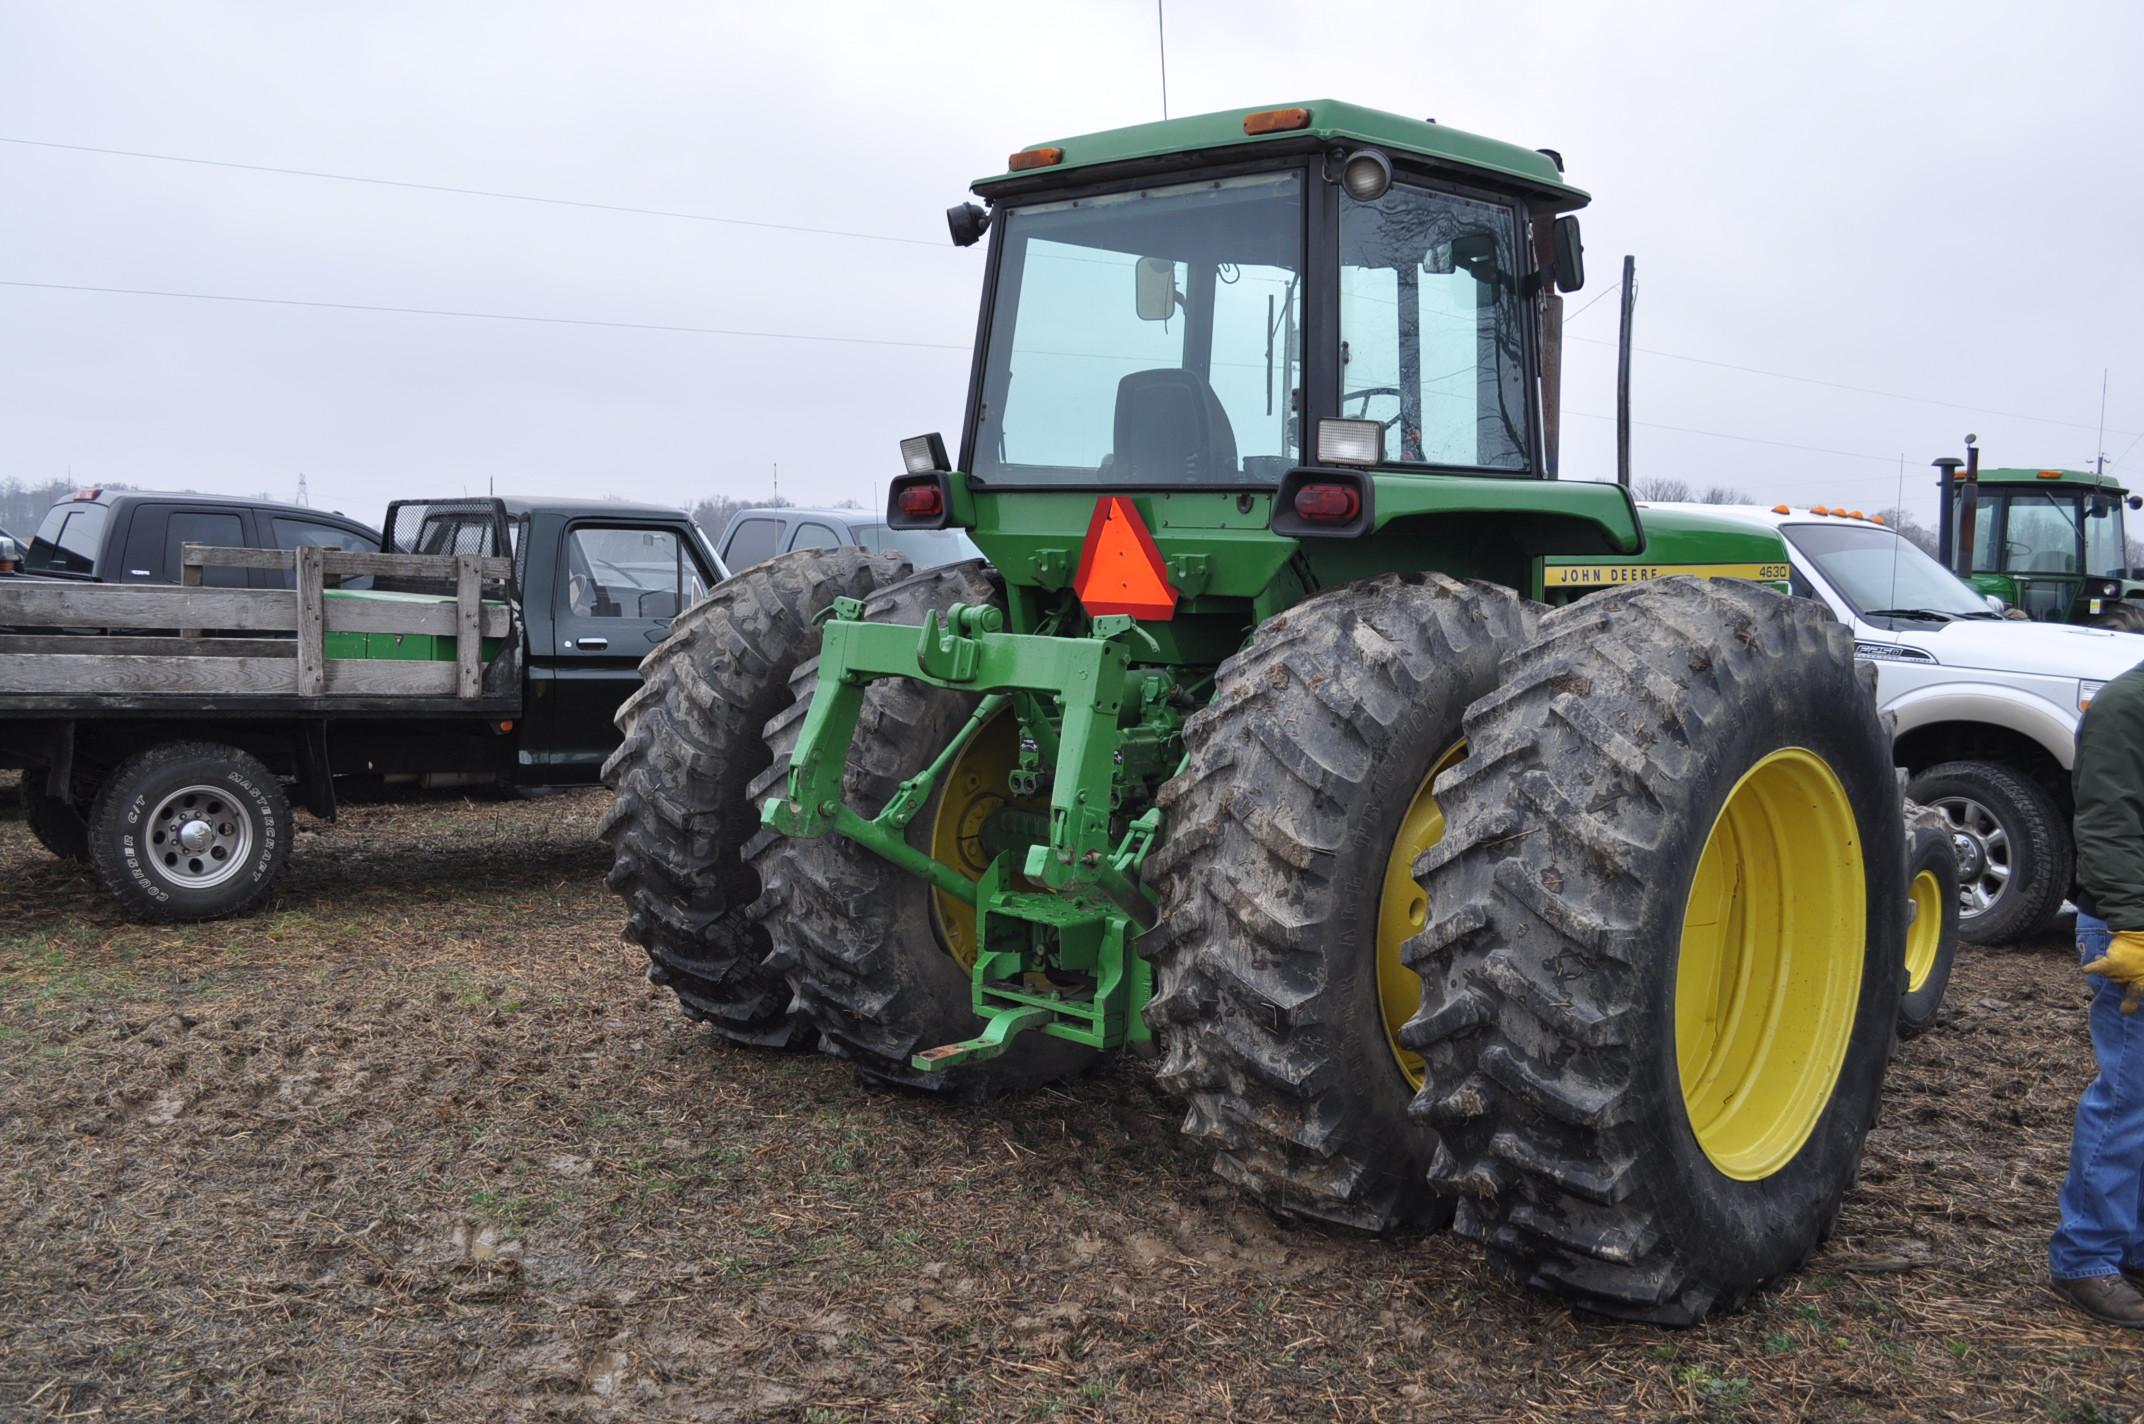 John Deere 4630 tractor, diesel, 20.8-38 hub duals, 14L-16 front, CHA, Quad range, 2 hyd remotes, - Image 3 of 22